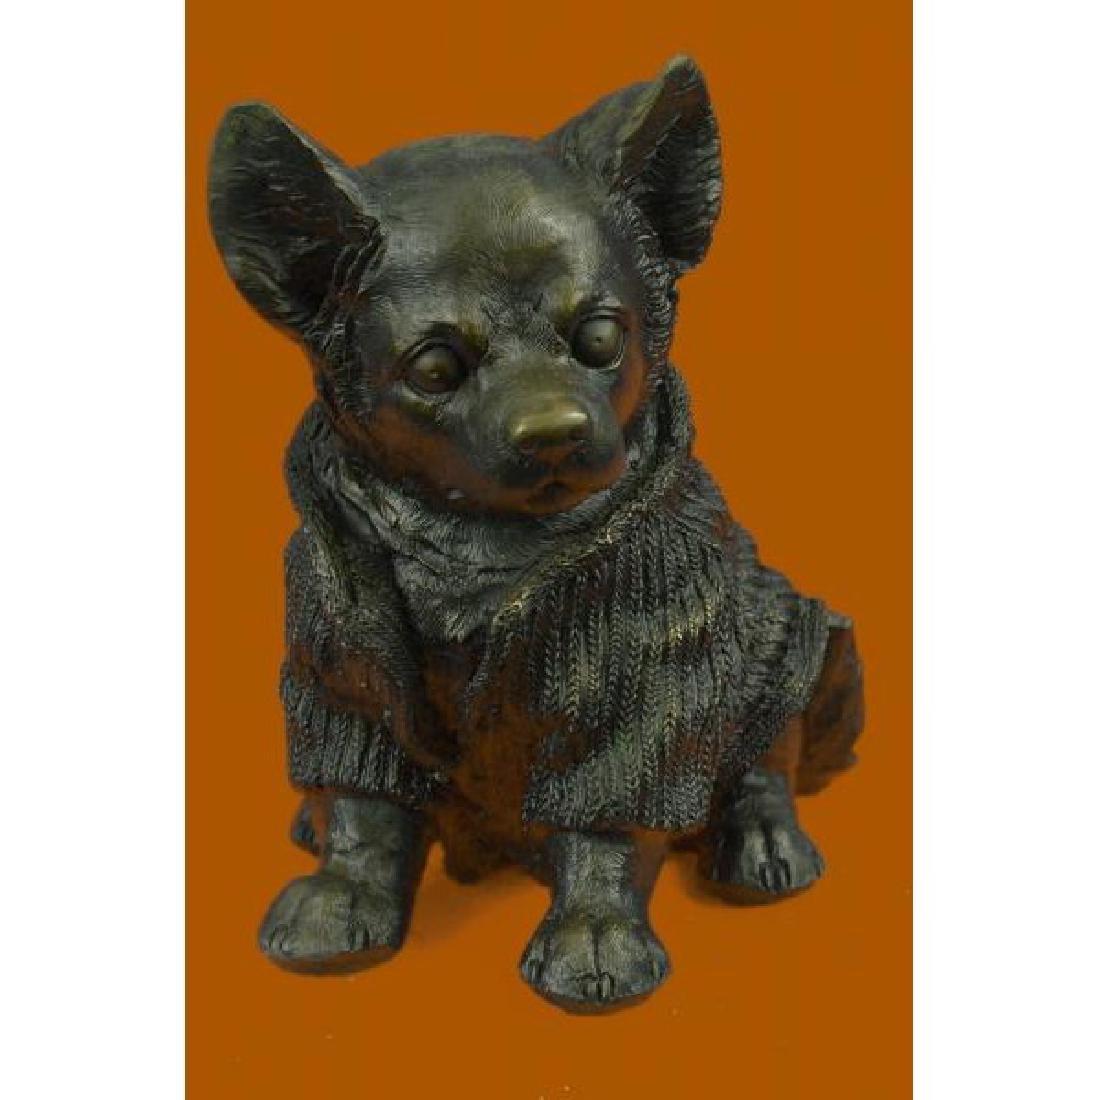 Cute Chihuahua Dog in Hooded Sweater Bronze Sculpture